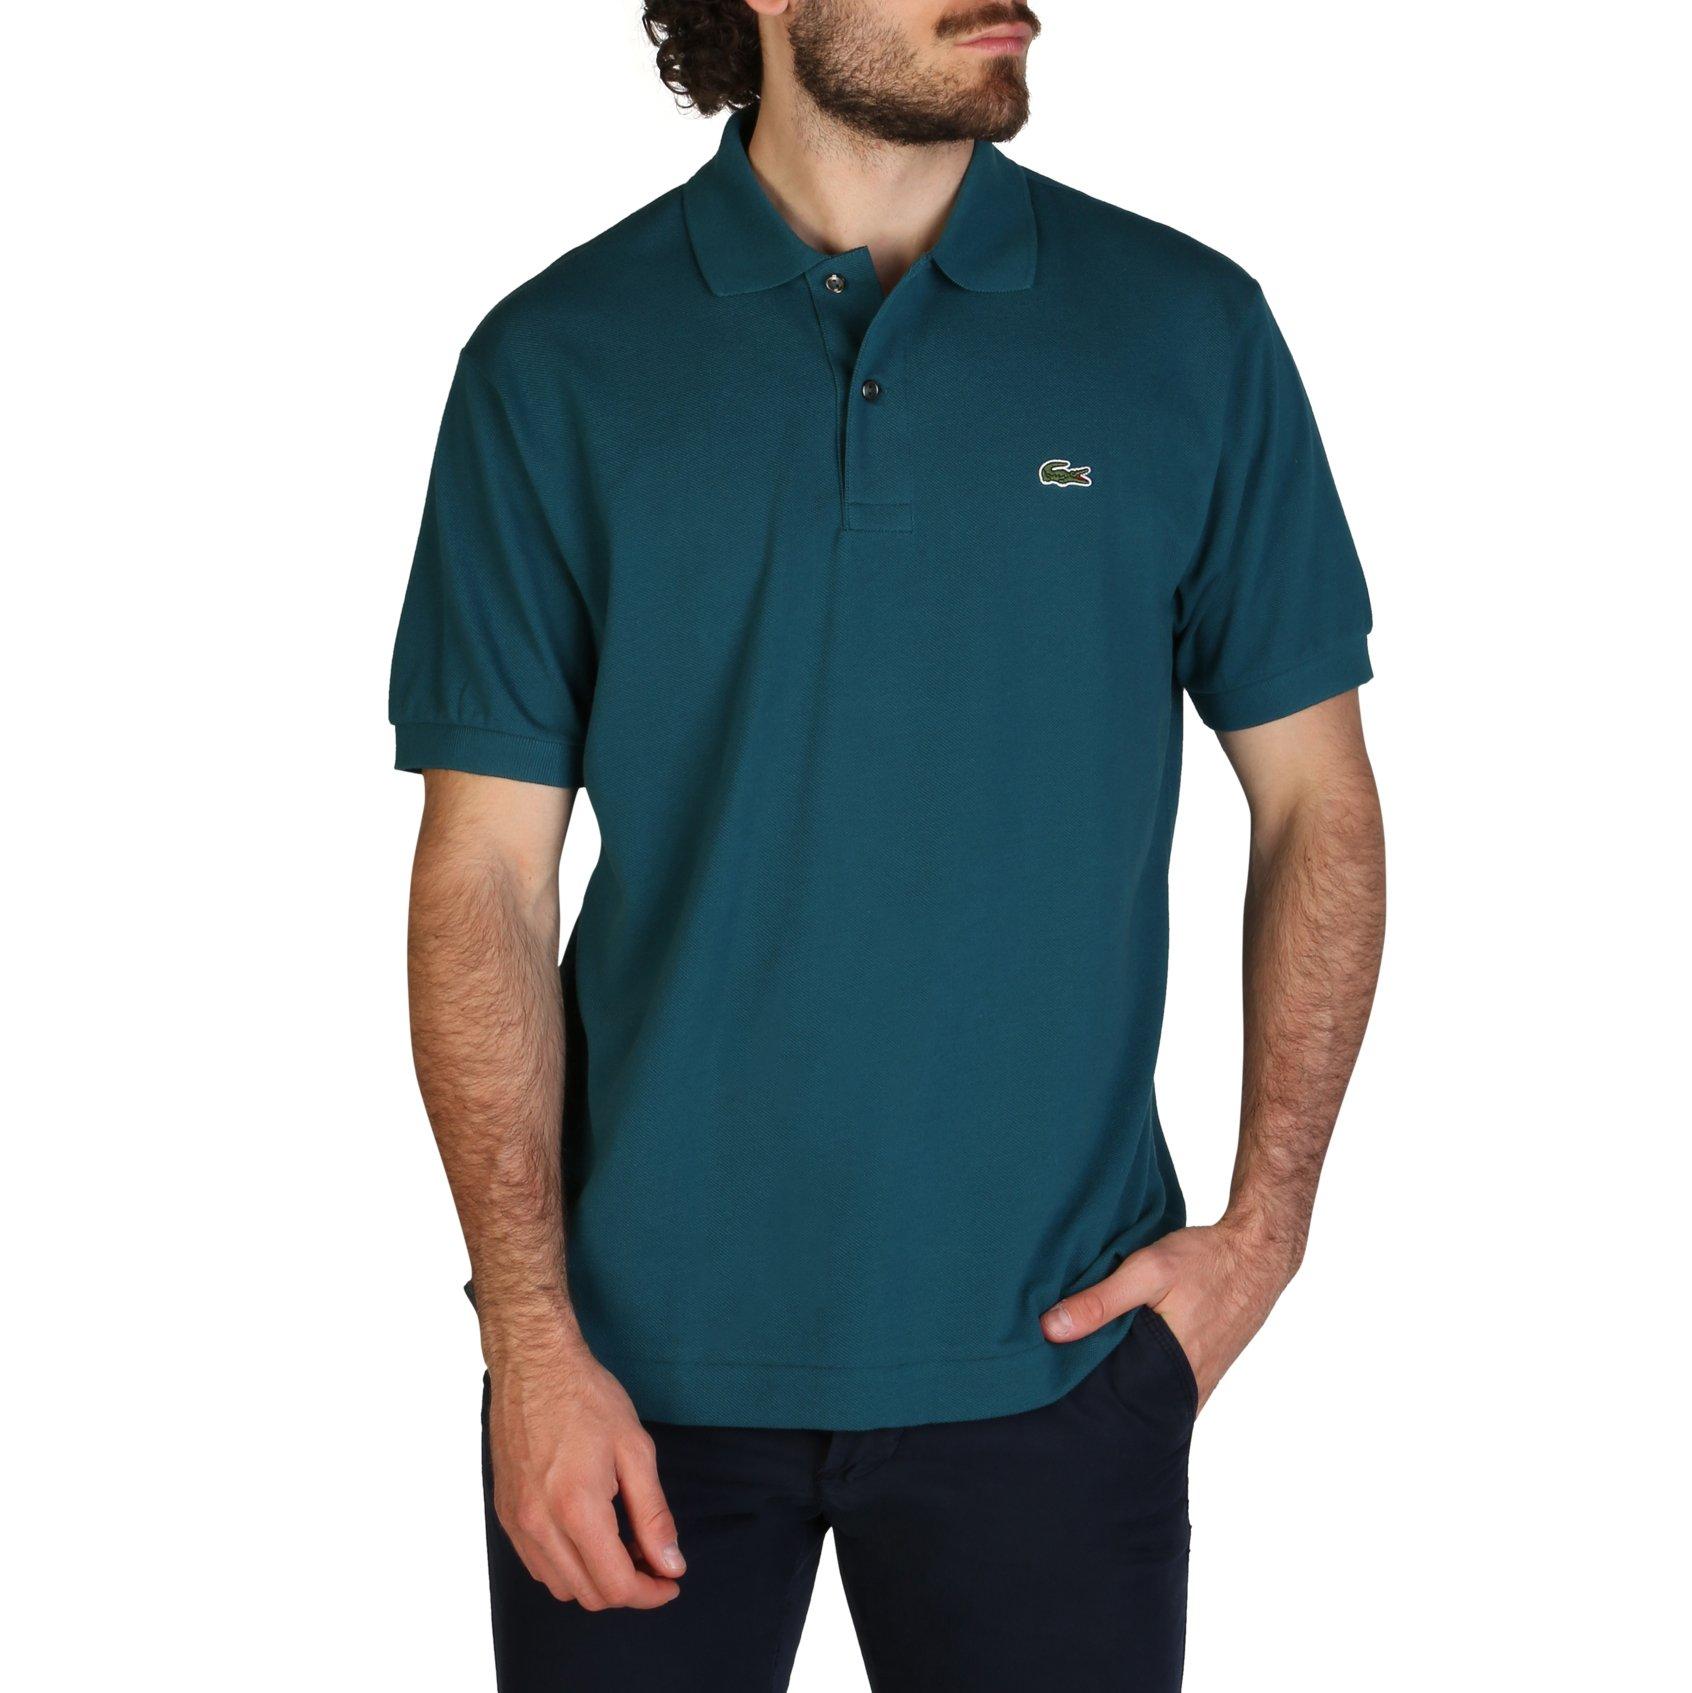 Lacoste Men's Polo Shirt Various Colours L1212_REGULAR - green S